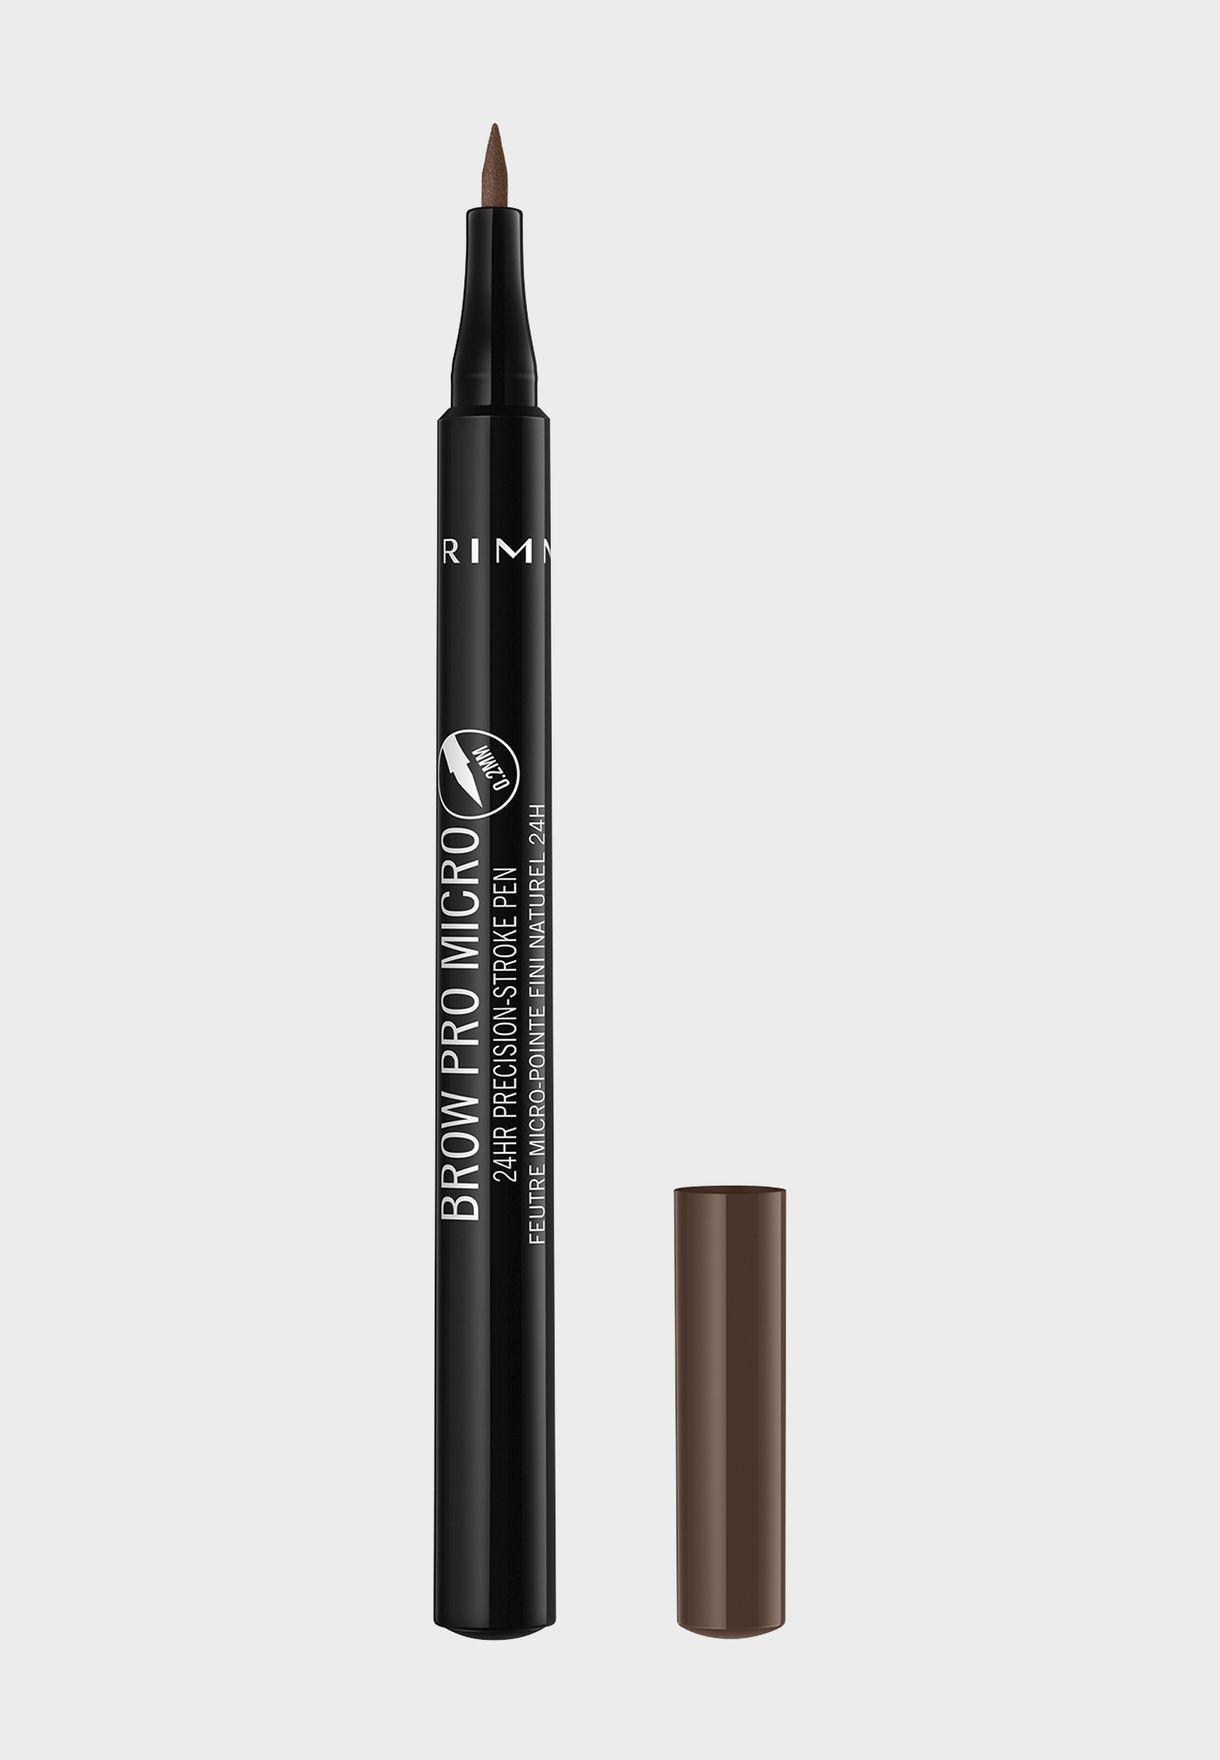 قلم الحواجب براو برو مايكرو 24 آورز 003 سوفت براون